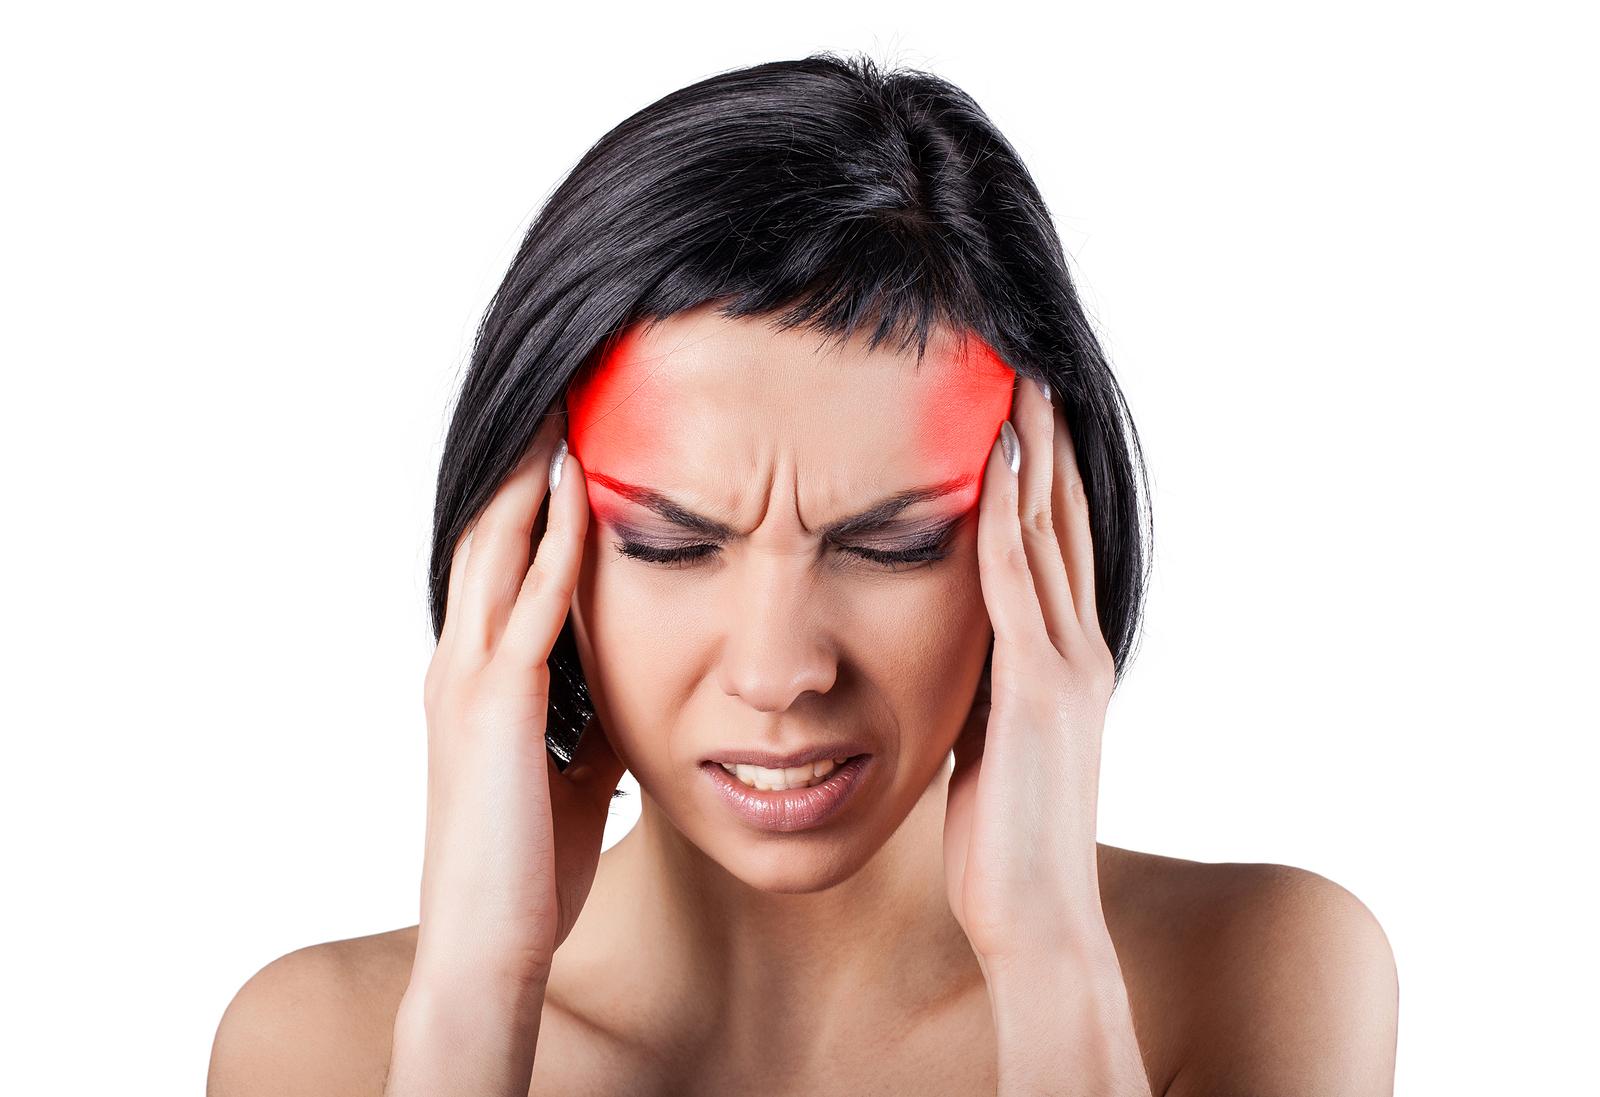 Jubilant Life Sciences gets USFDA nod for migraine treatment drug